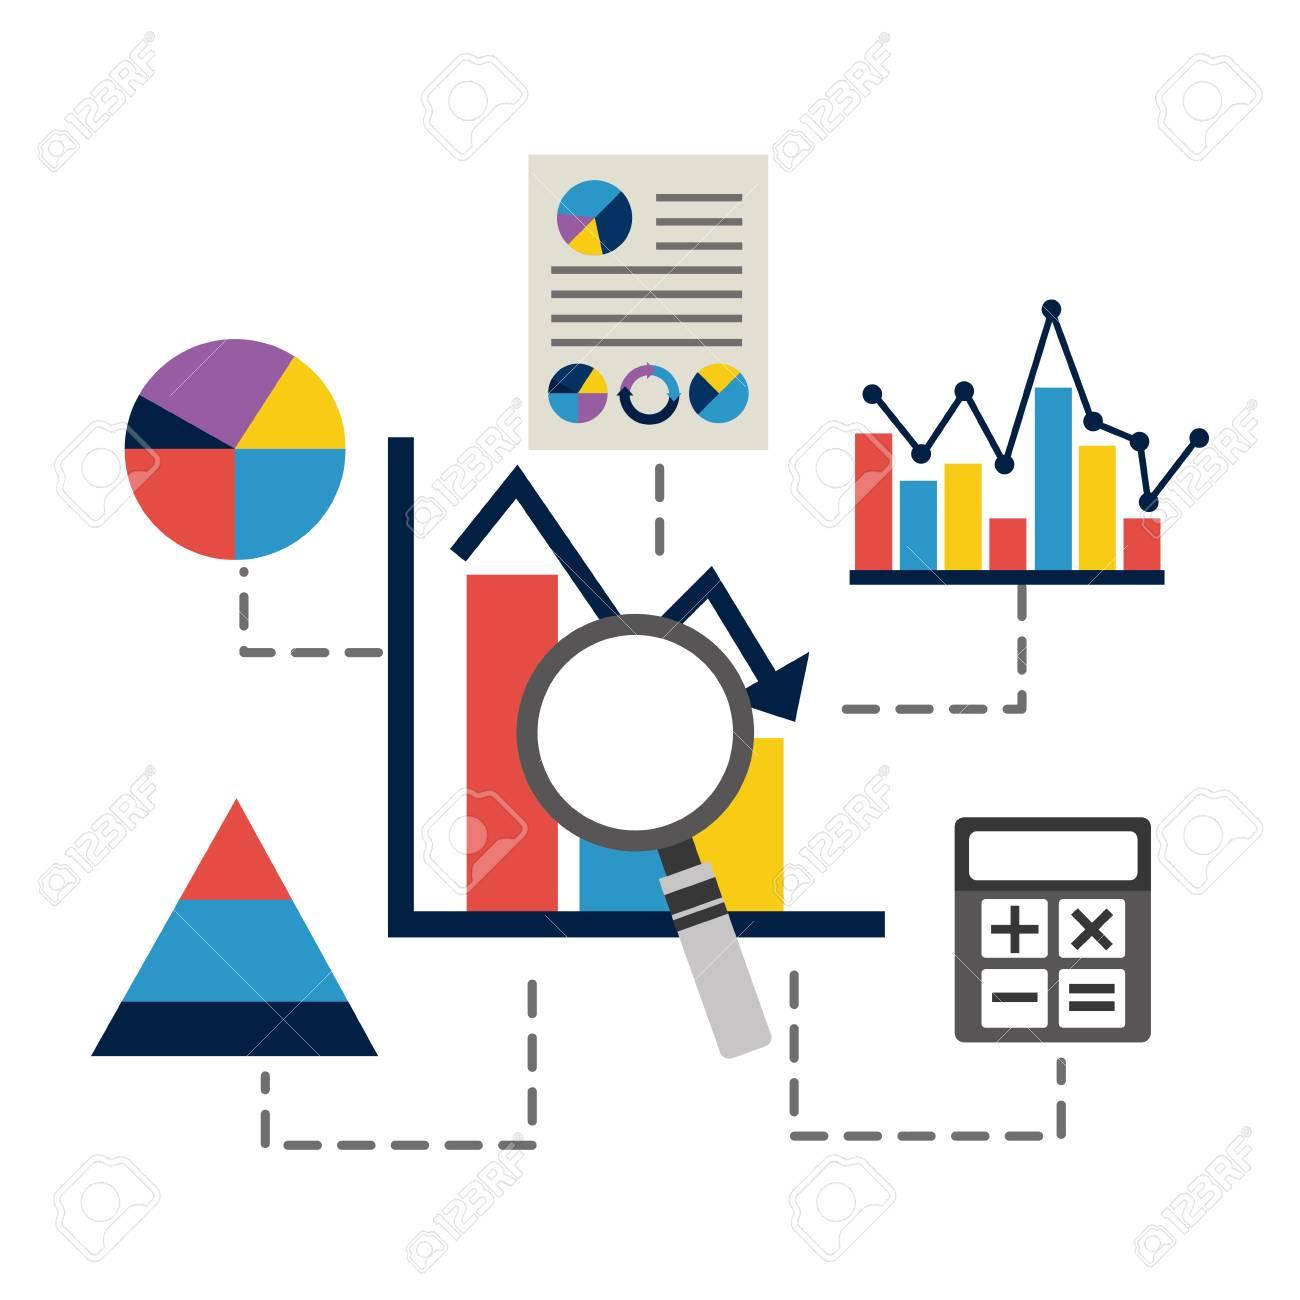 Bar graph statistics analysis calculator business vector bar graph statistics analysis calculator business vector illustration stock vector 97925248 ccuart Image collections